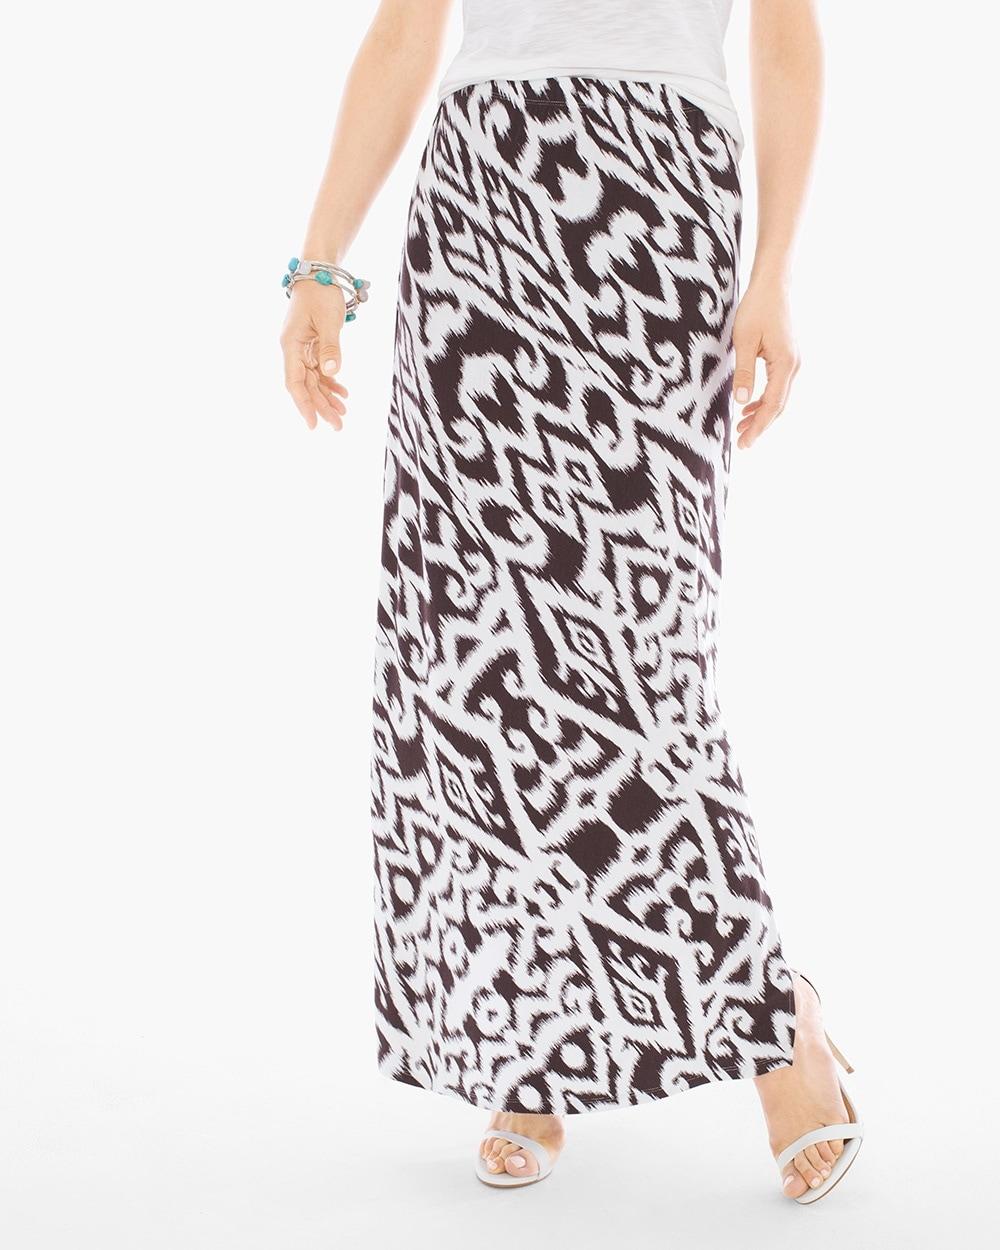 0bcd464b59 Tribal Bi-Color Maxi Skirt - Chico's